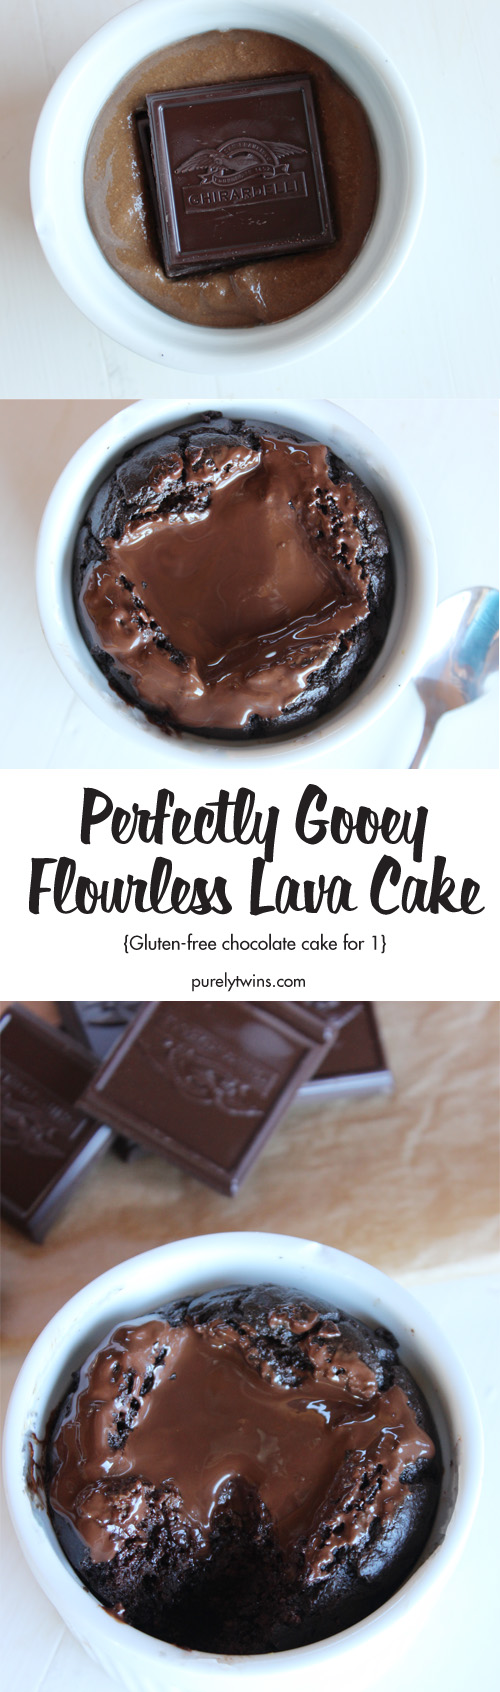 Flourless chocolate lava cake. Gluten-free. Grain-free. Serves 1. -